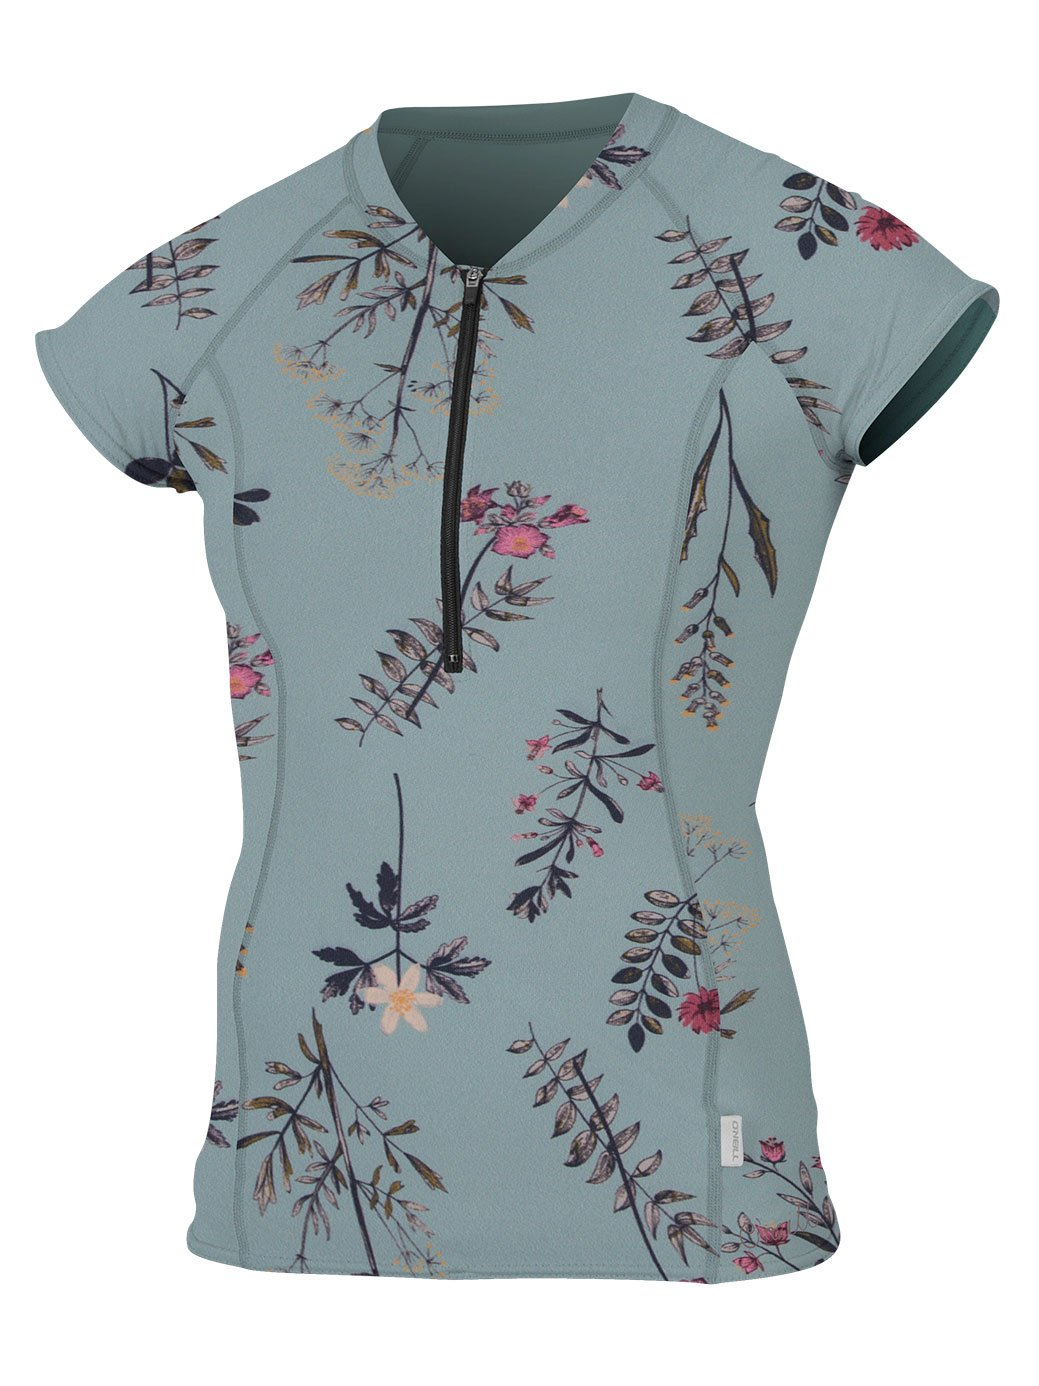 O'Neill Women's Cap Sleeve Sun Shirt Front Zip Piper Floral/Piper Floral Small